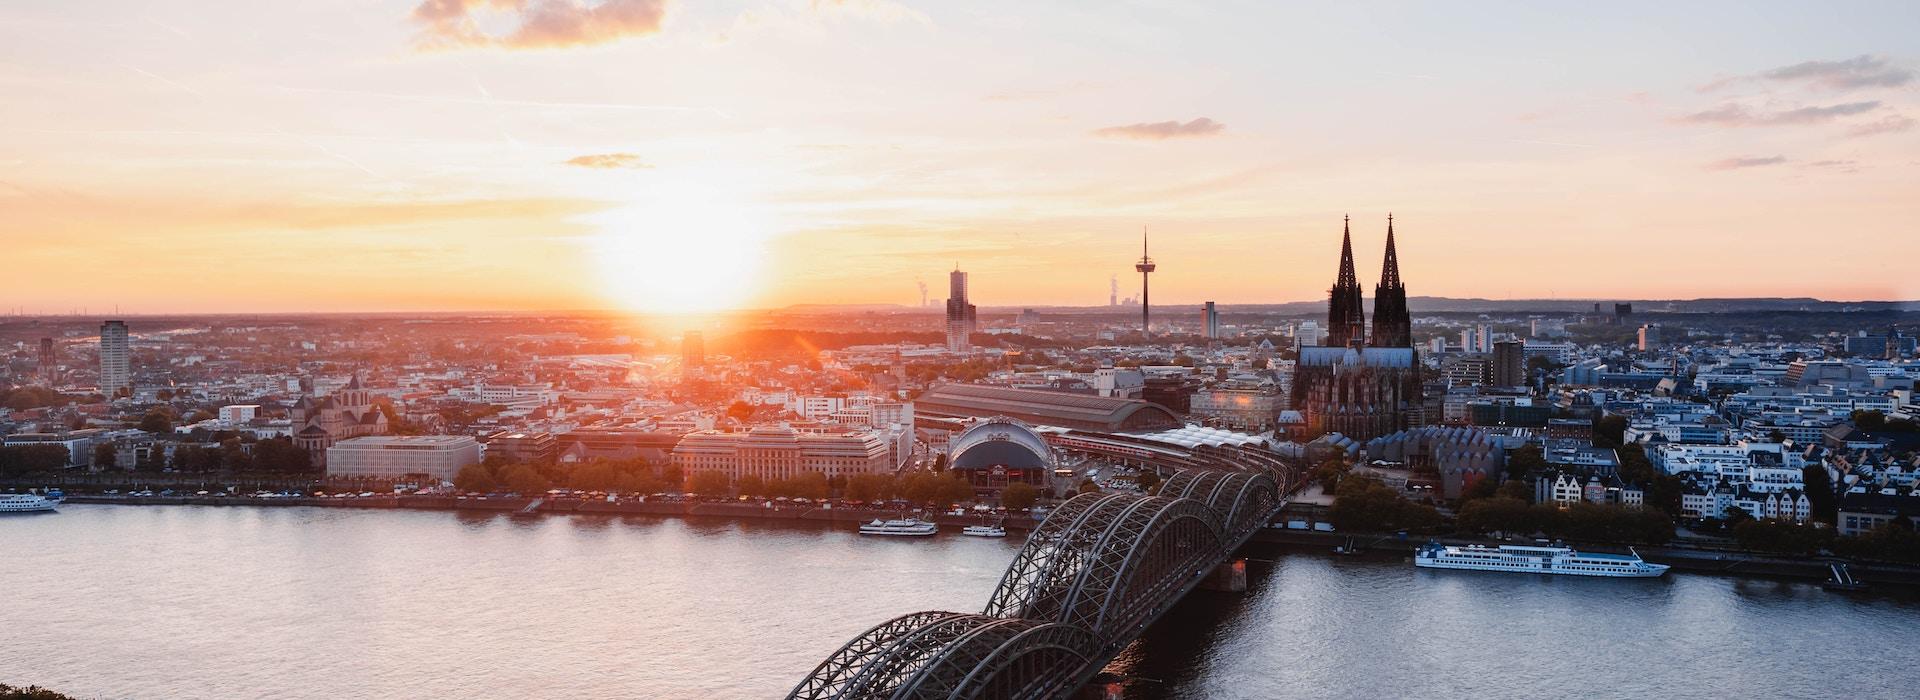 Köln-Kölner-Dom-unsplash-1